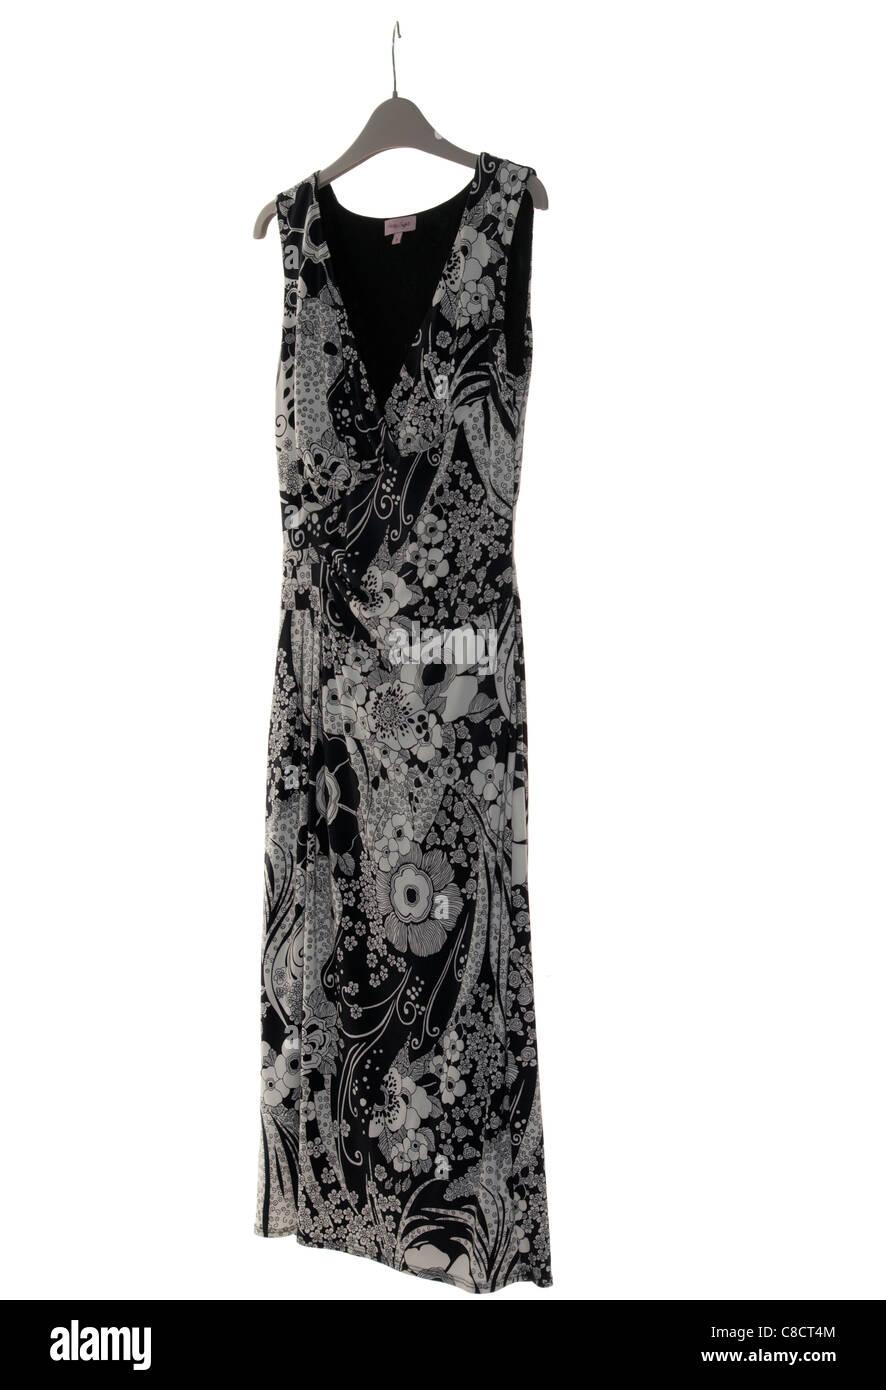 Ladies Dress Stockfotos & Ladies Dress Bilder - Alamy